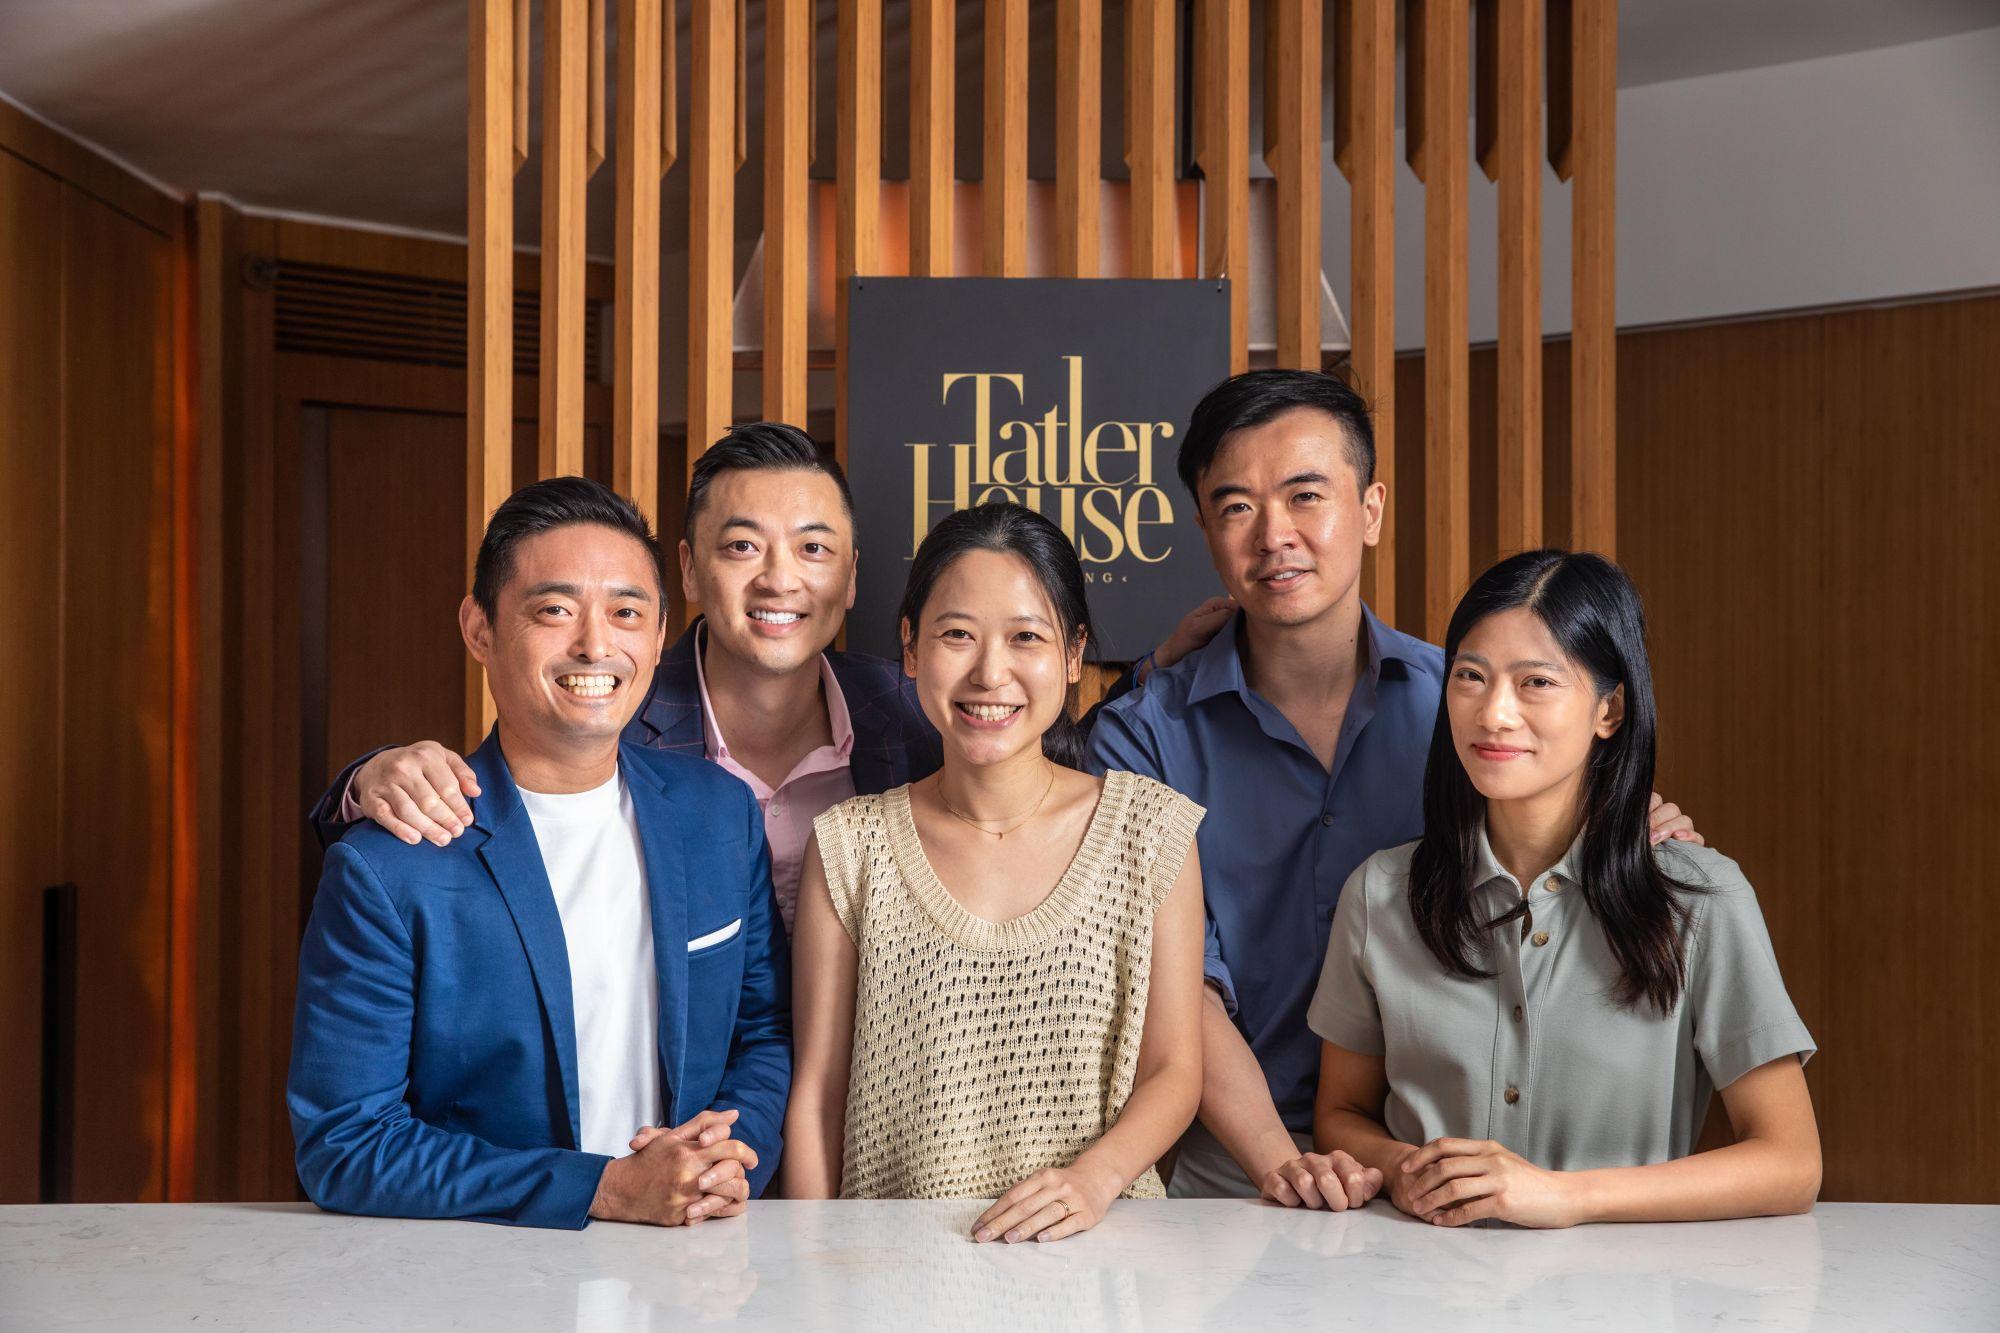 Arthur Lam, Danny Yeung, Fiona Lau, Fred Ngan, Crystal Pang